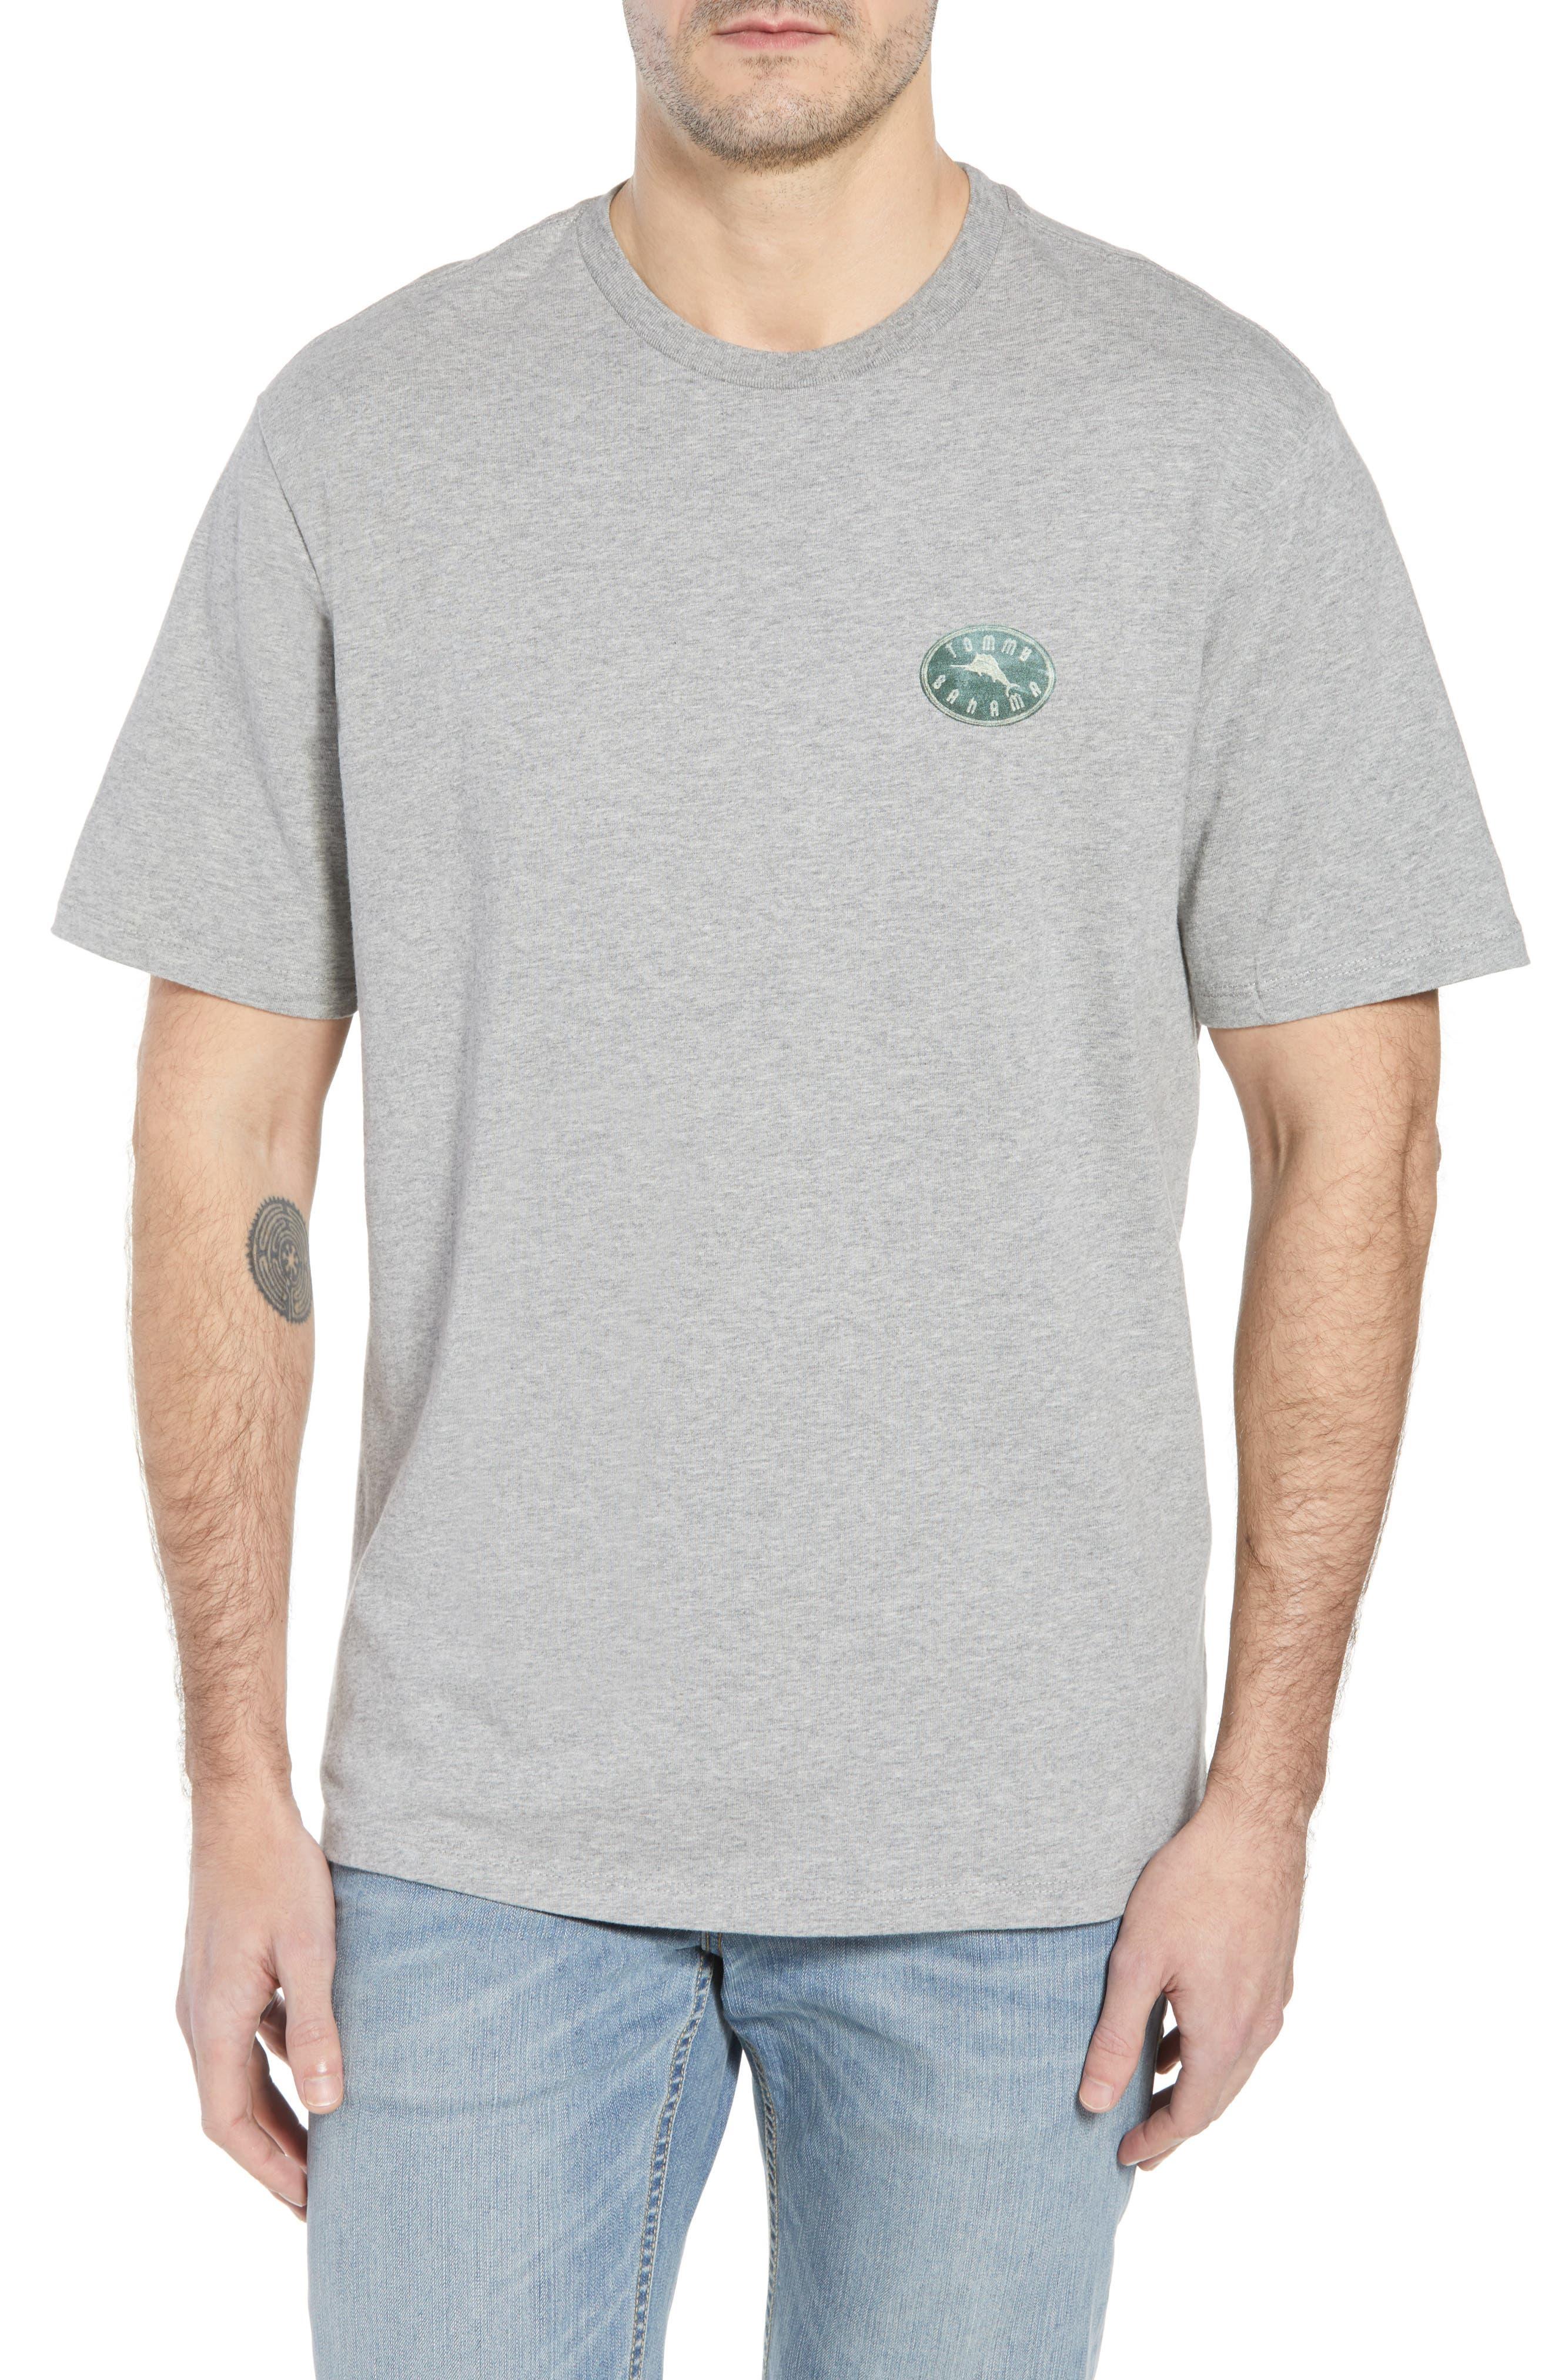 Chalk & Roll T-Shirt,                             Main thumbnail 1, color,                             Grey Heather